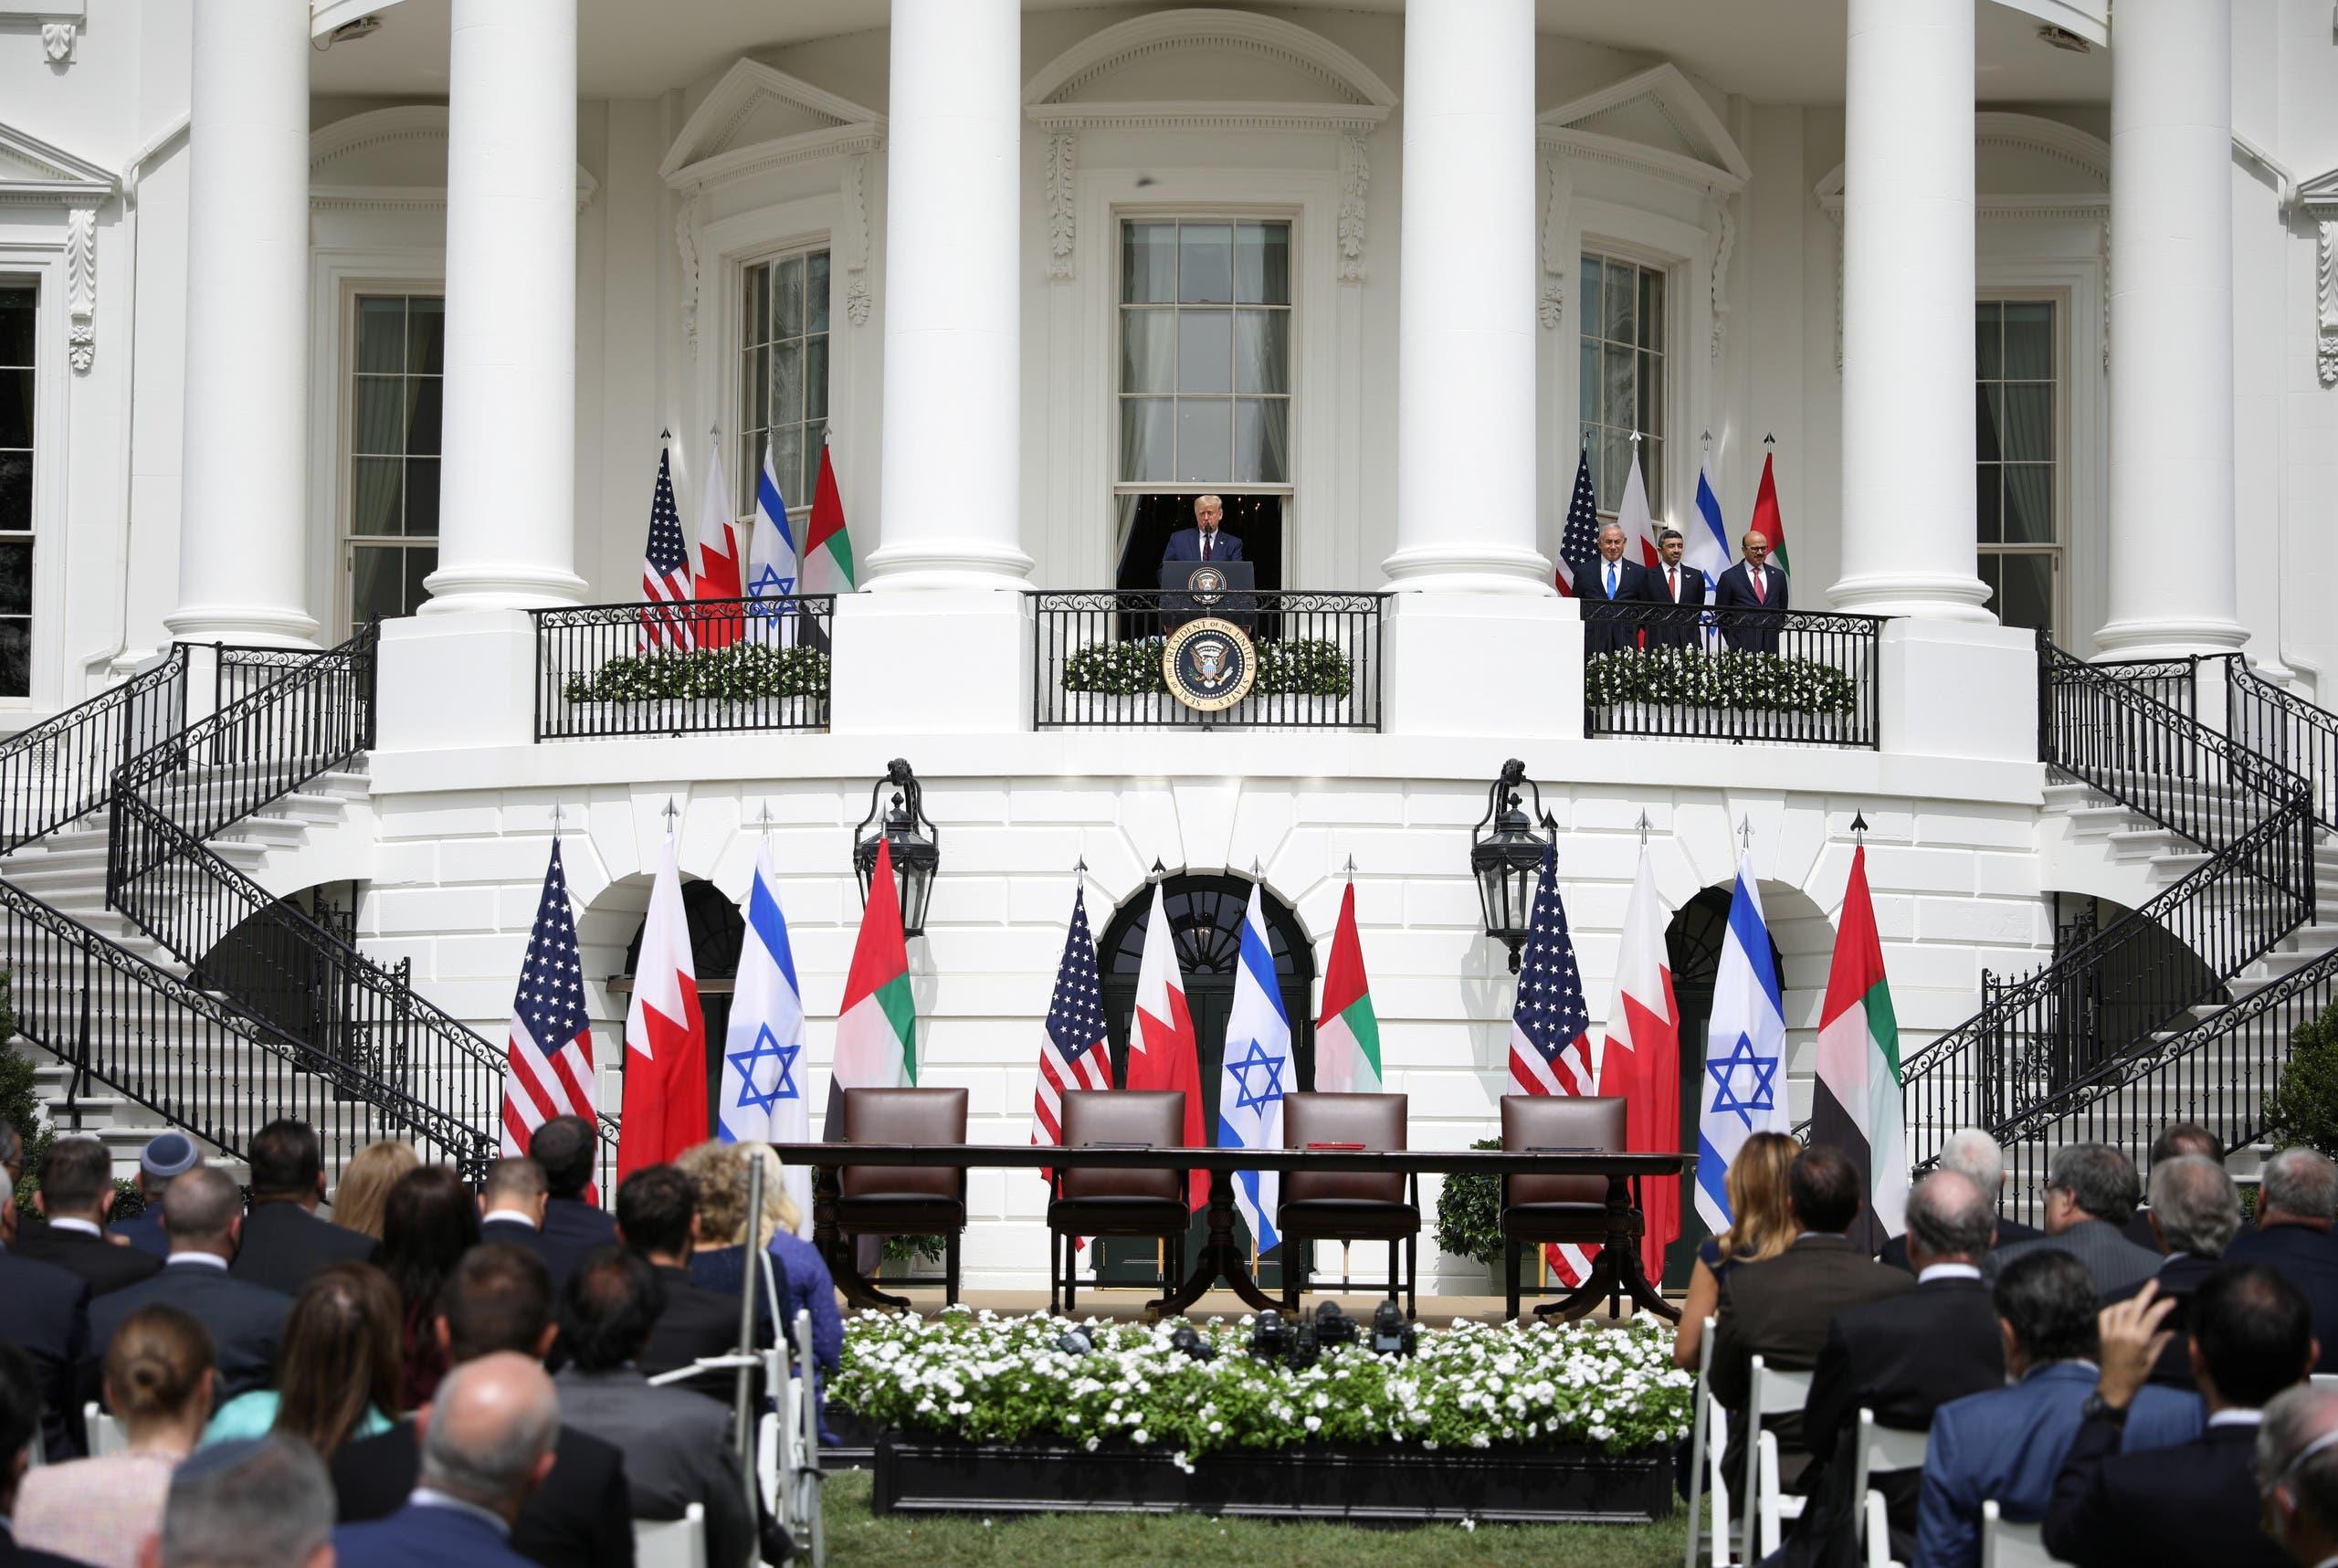 US President Donald Trump speaks as Israeli PM Benjamin Netanyahu, UAE FM Sheikh Abdullah bin Zayed and Bahraini FM Abdullatif Al Zayani in Washington, Sept. 15, 2020. (Reuters)